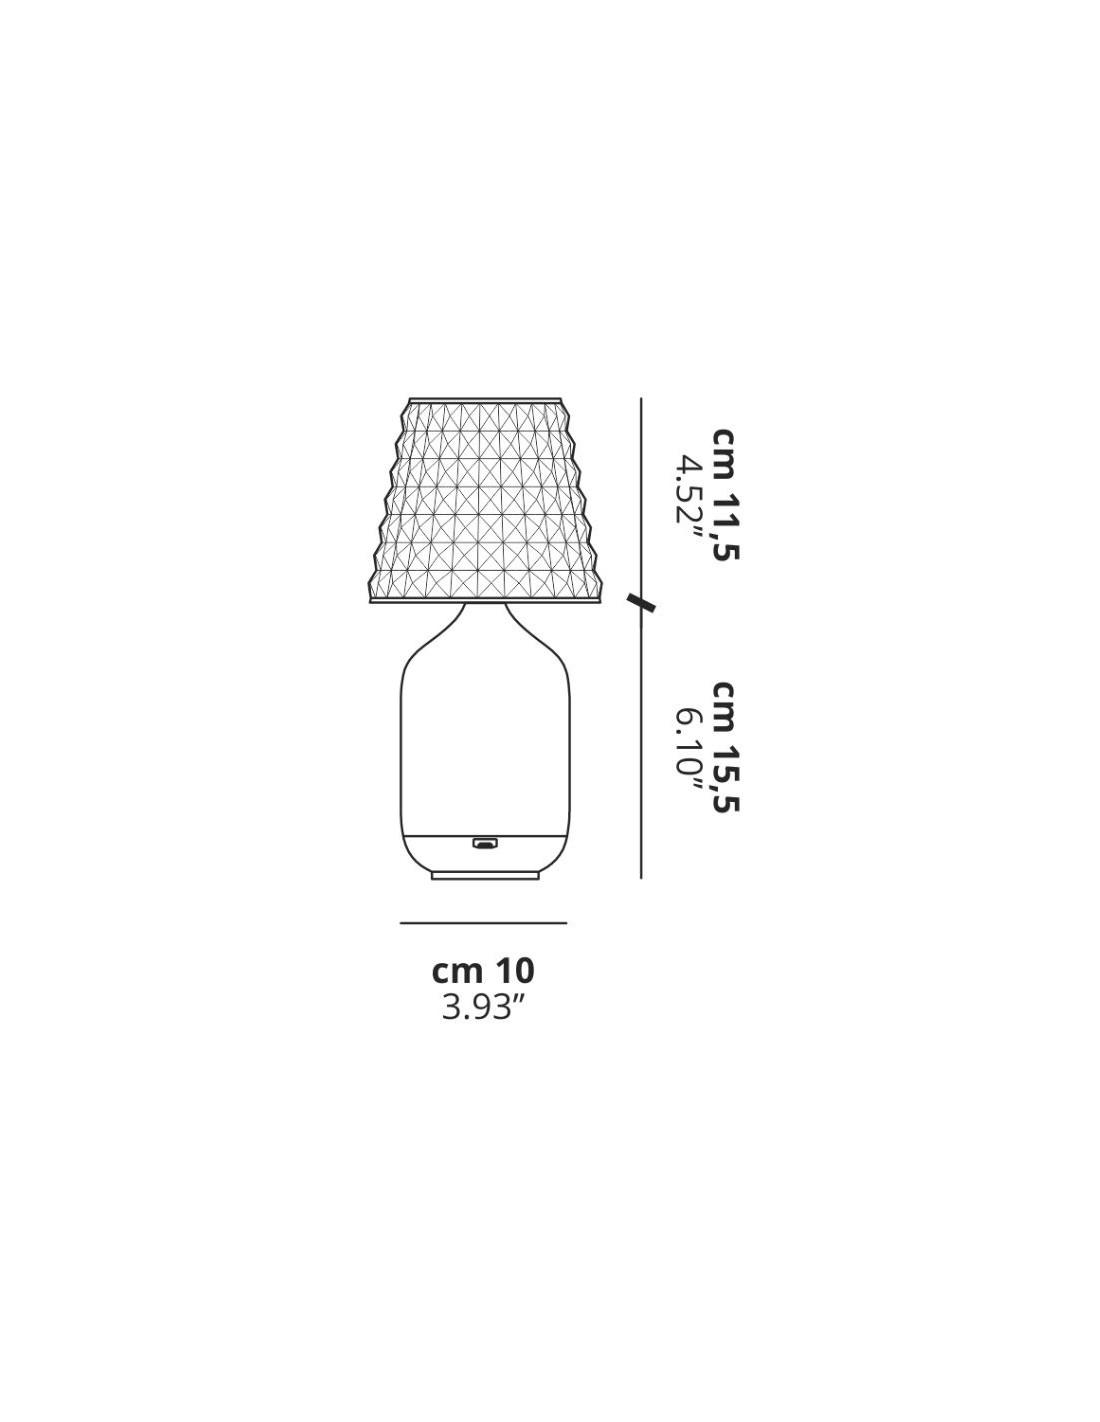 plan lampe poser valentina sans fil de studio italia design. Black Bedroom Furniture Sets. Home Design Ideas